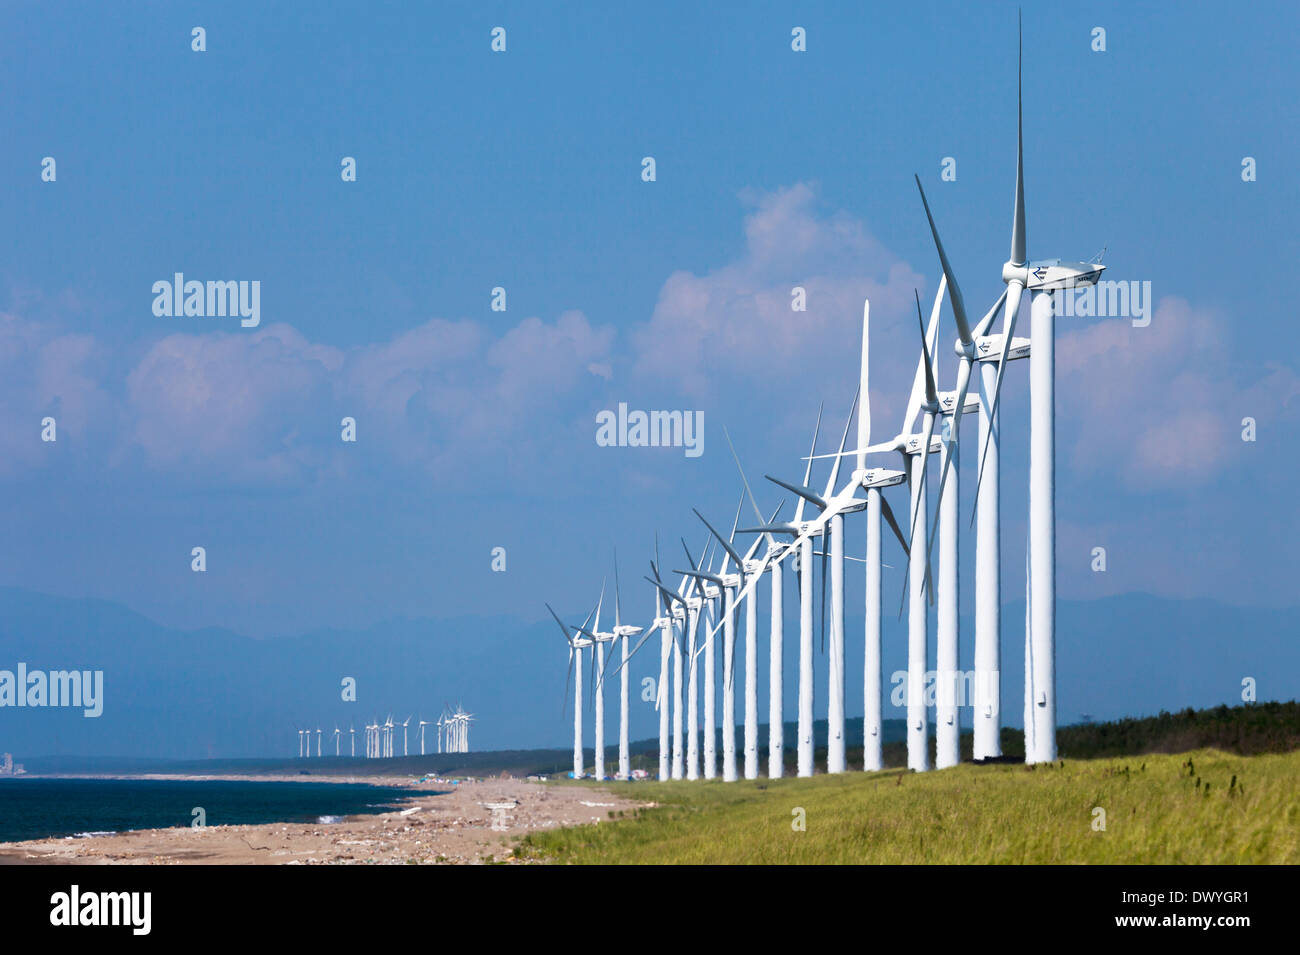 Noshiro Wind Power Station, Noshiro, Akita Präfektur, Japan Stockbild